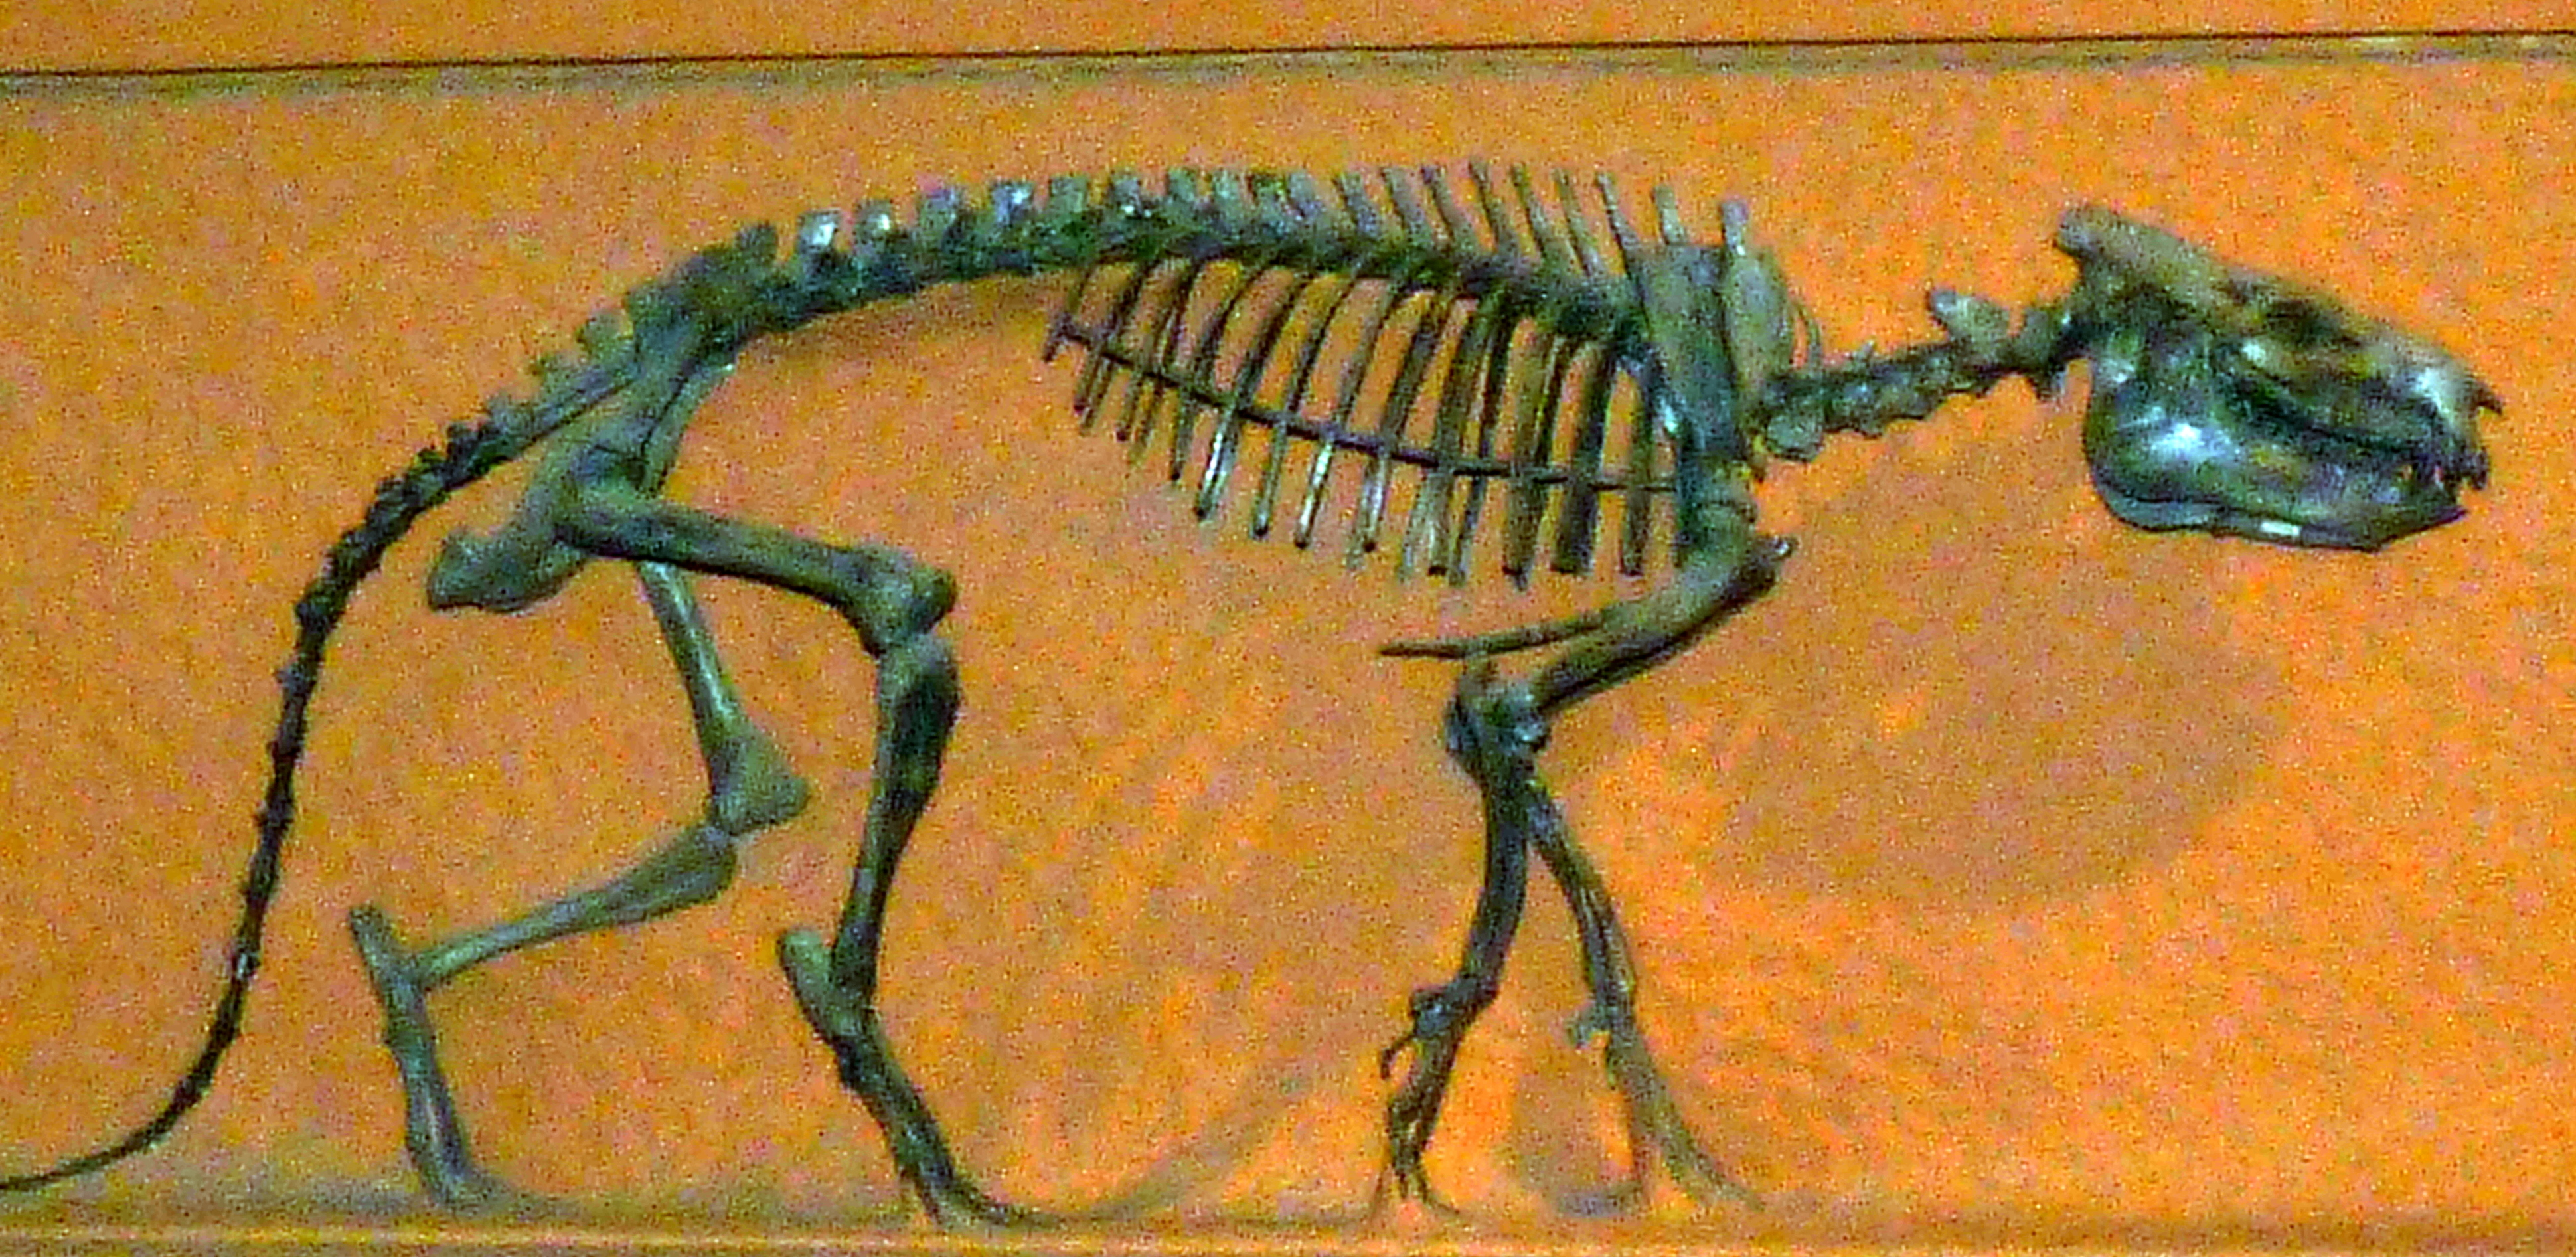 Merycoidodon culbertsoni Leidy, 1848